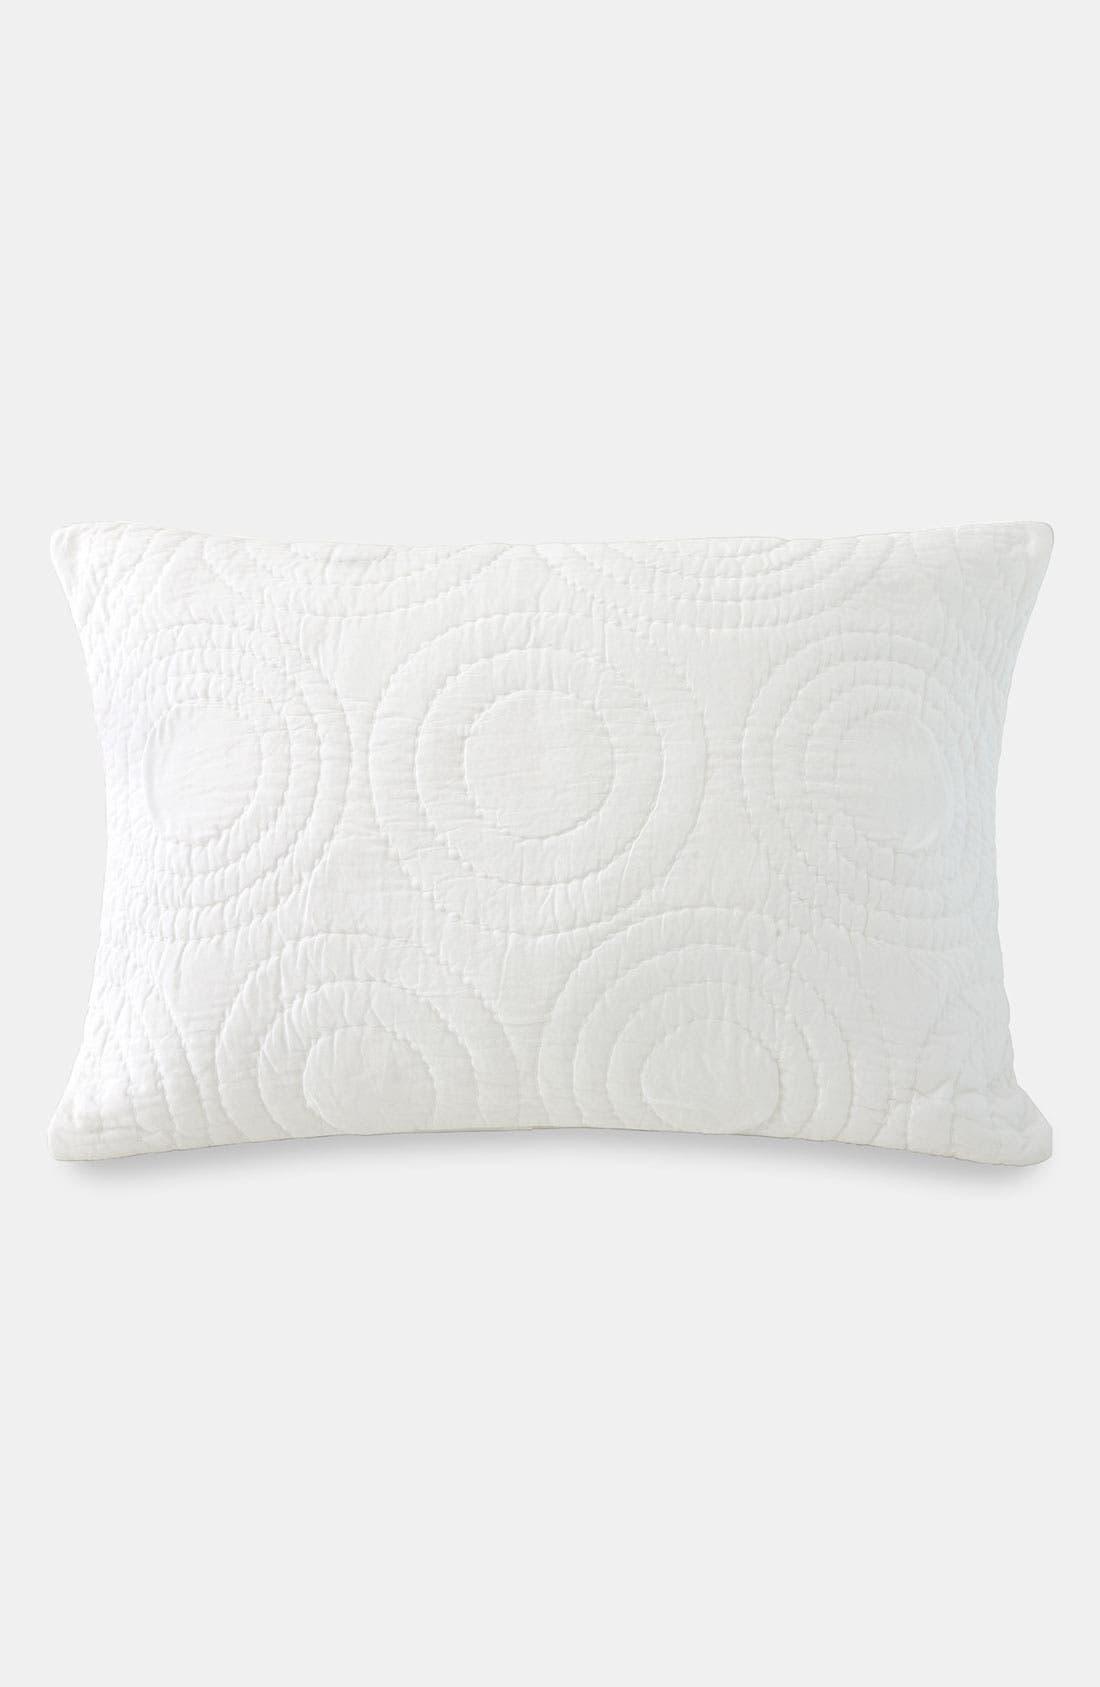 Main Image - DKNY 'Pure Romance' Pillow Sham